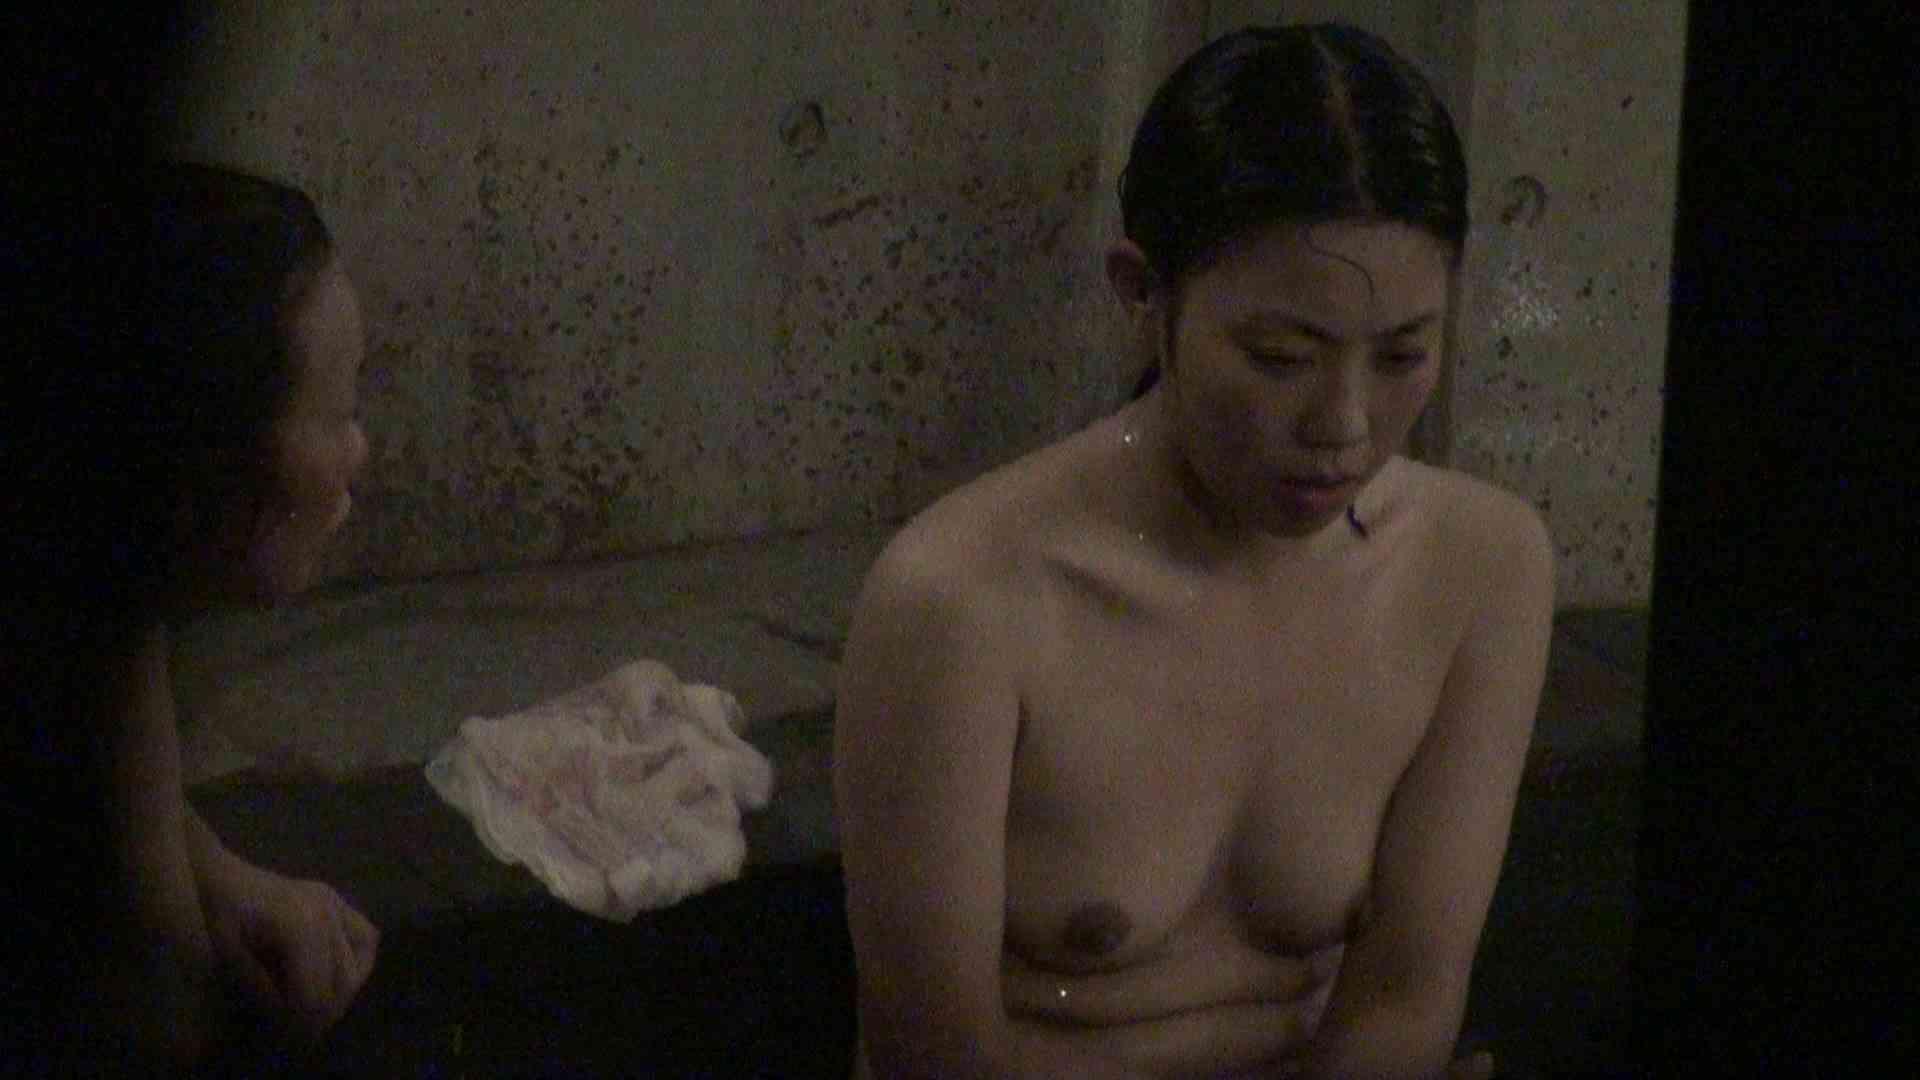 Aquaな露天風呂Vol.330 0   0  57連発 13